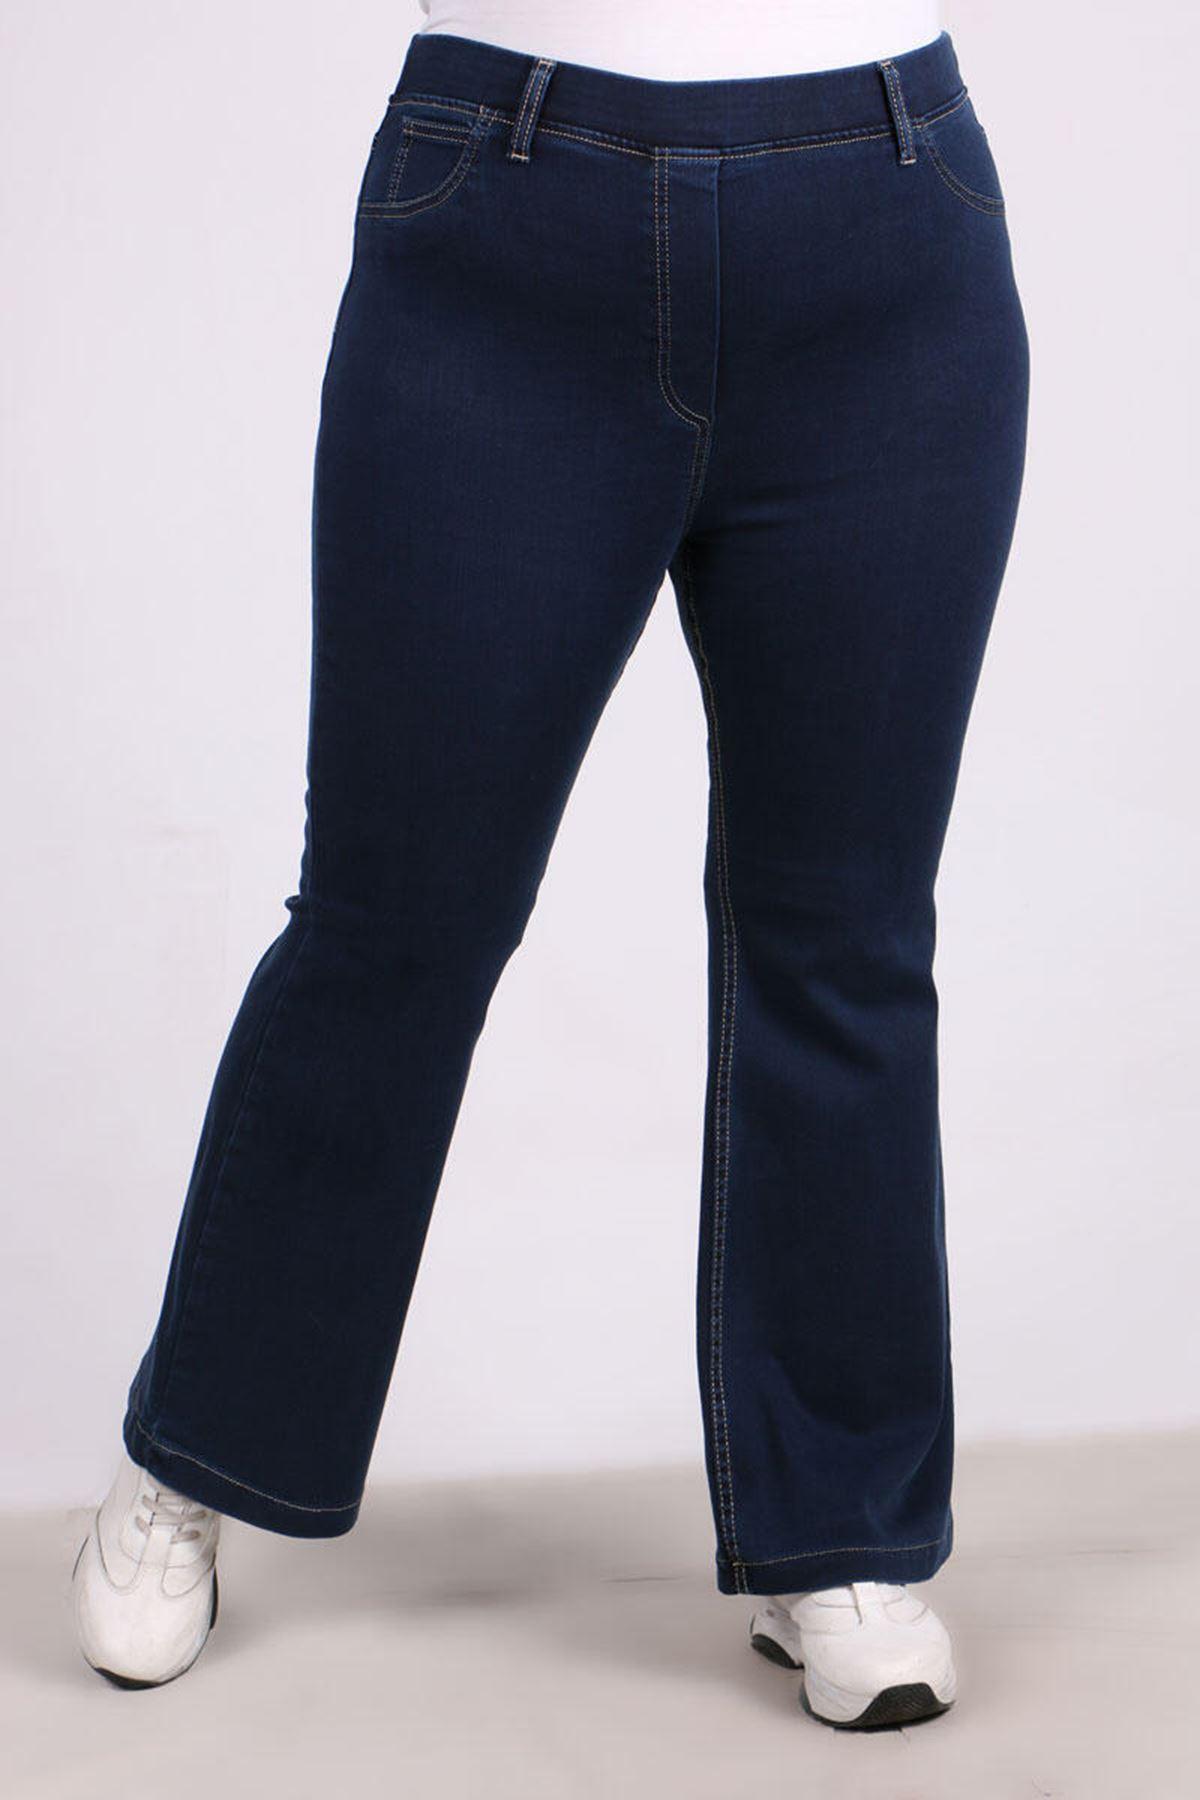 9137 Büyük Beden Beli Lastikli İspanyol Paça Kot Pantalon-Mavi